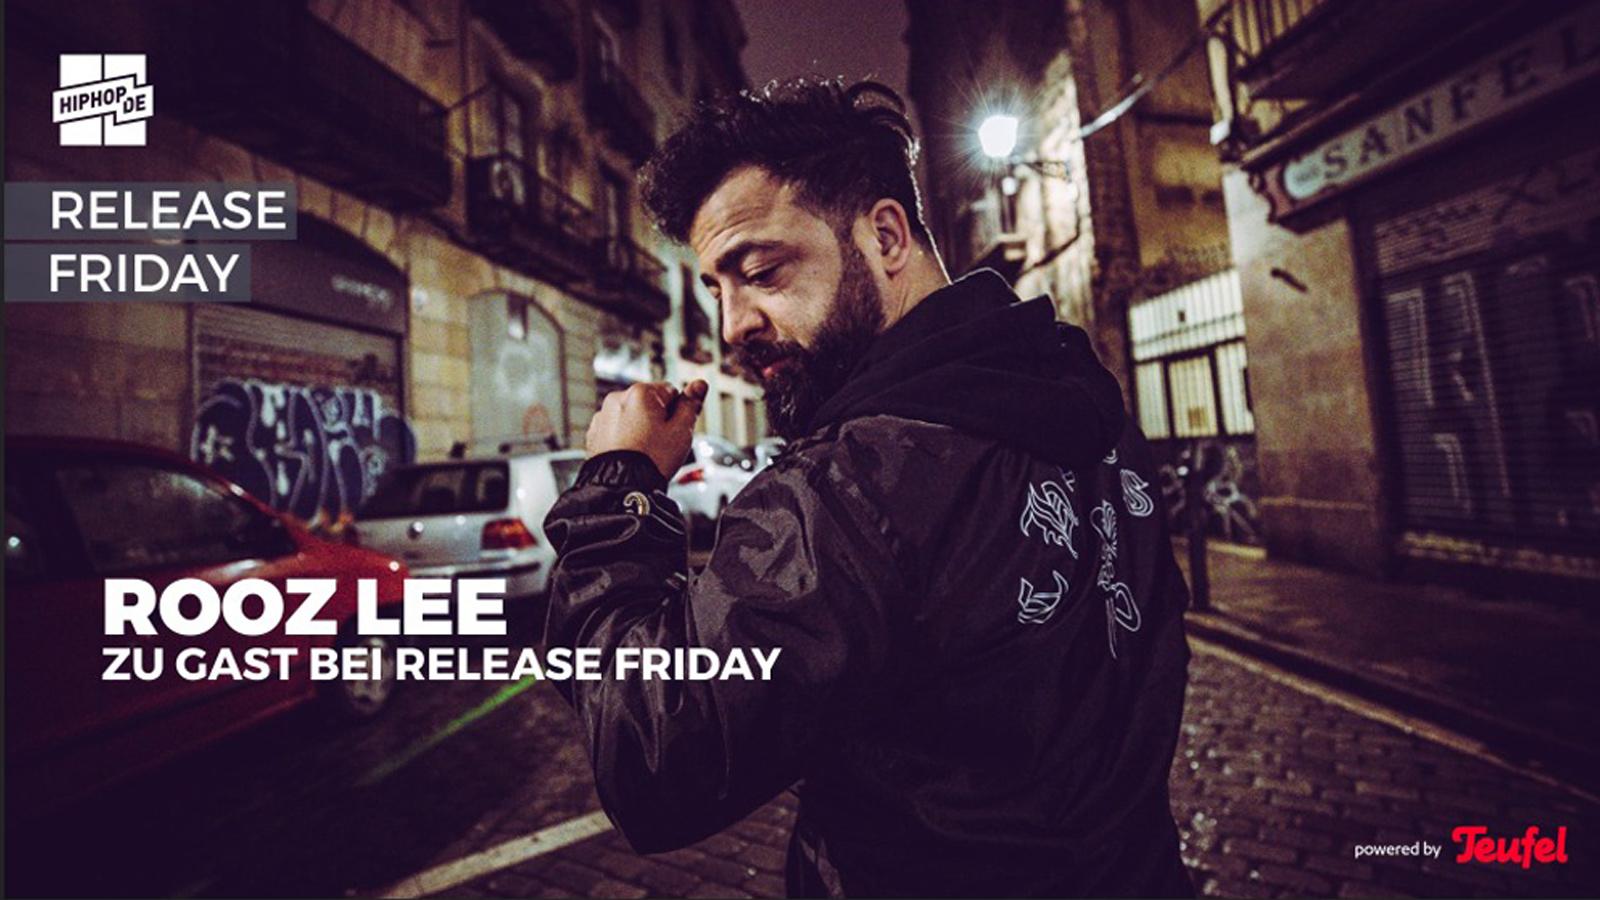 Release Friday powered by Teufel mit Rooz über Bausa, Rin, Ufo361, Sierra Kidd, OG Keemo,...